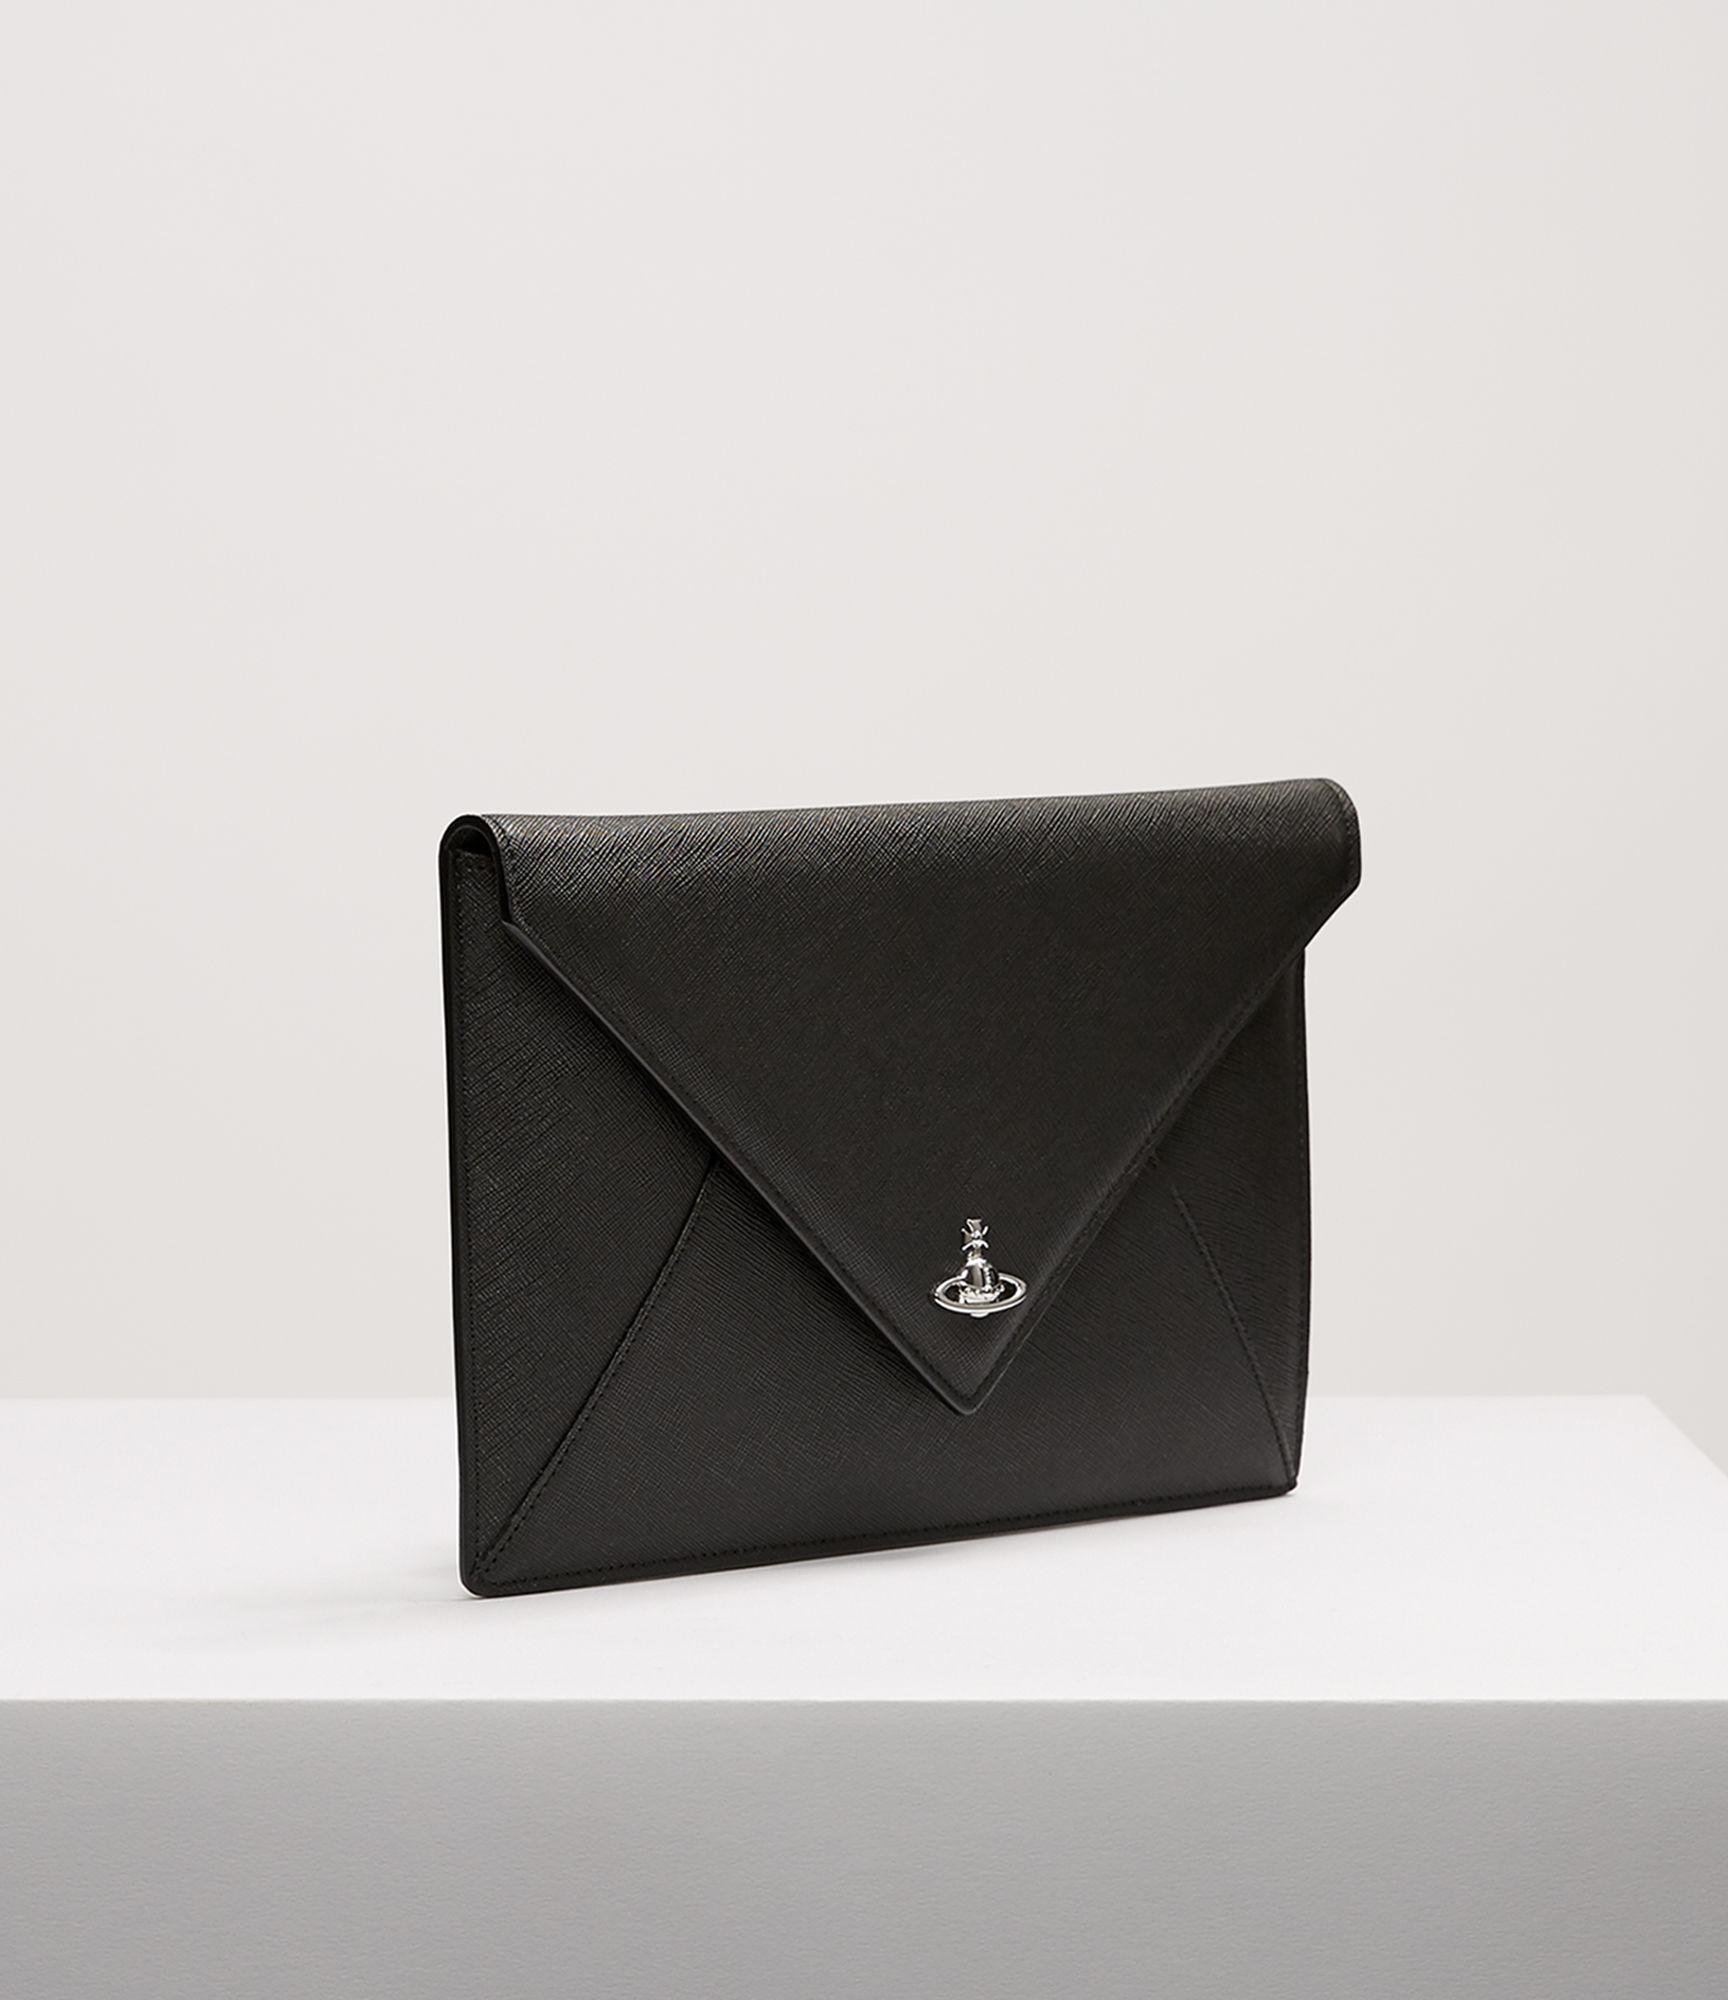 5a9787b16bb21 Vivienne Westwood Pouch 7040 Envelope Clutch Black in Black - Save ...